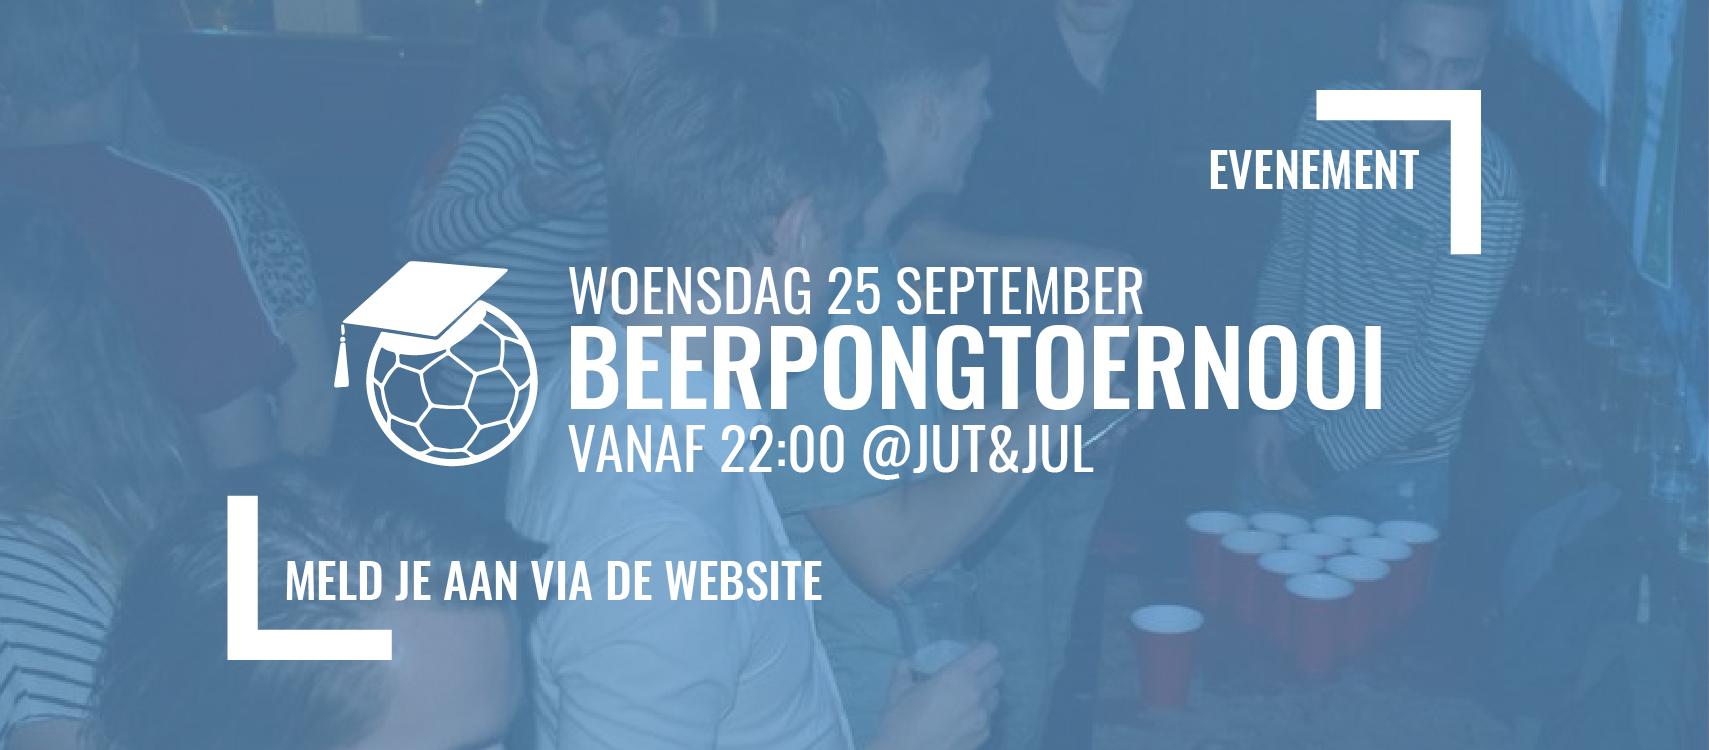 Beerpongtoernooi 2019